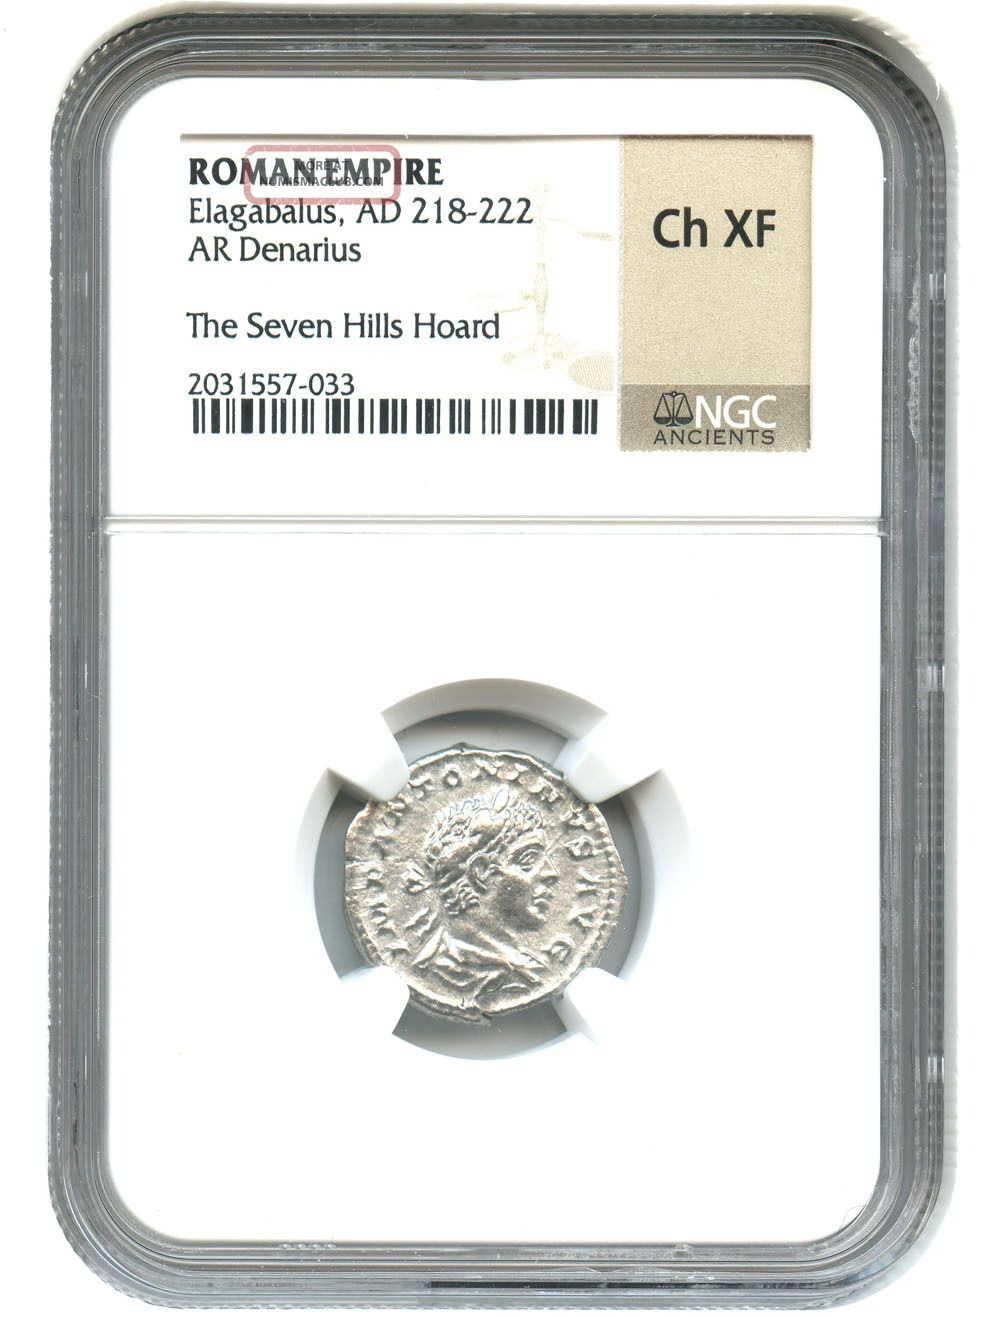 Ad 218 - 222 Elagabalus Ar Denarius Ngc Choice Xf (ancient Roman) Coins: Ancient photo